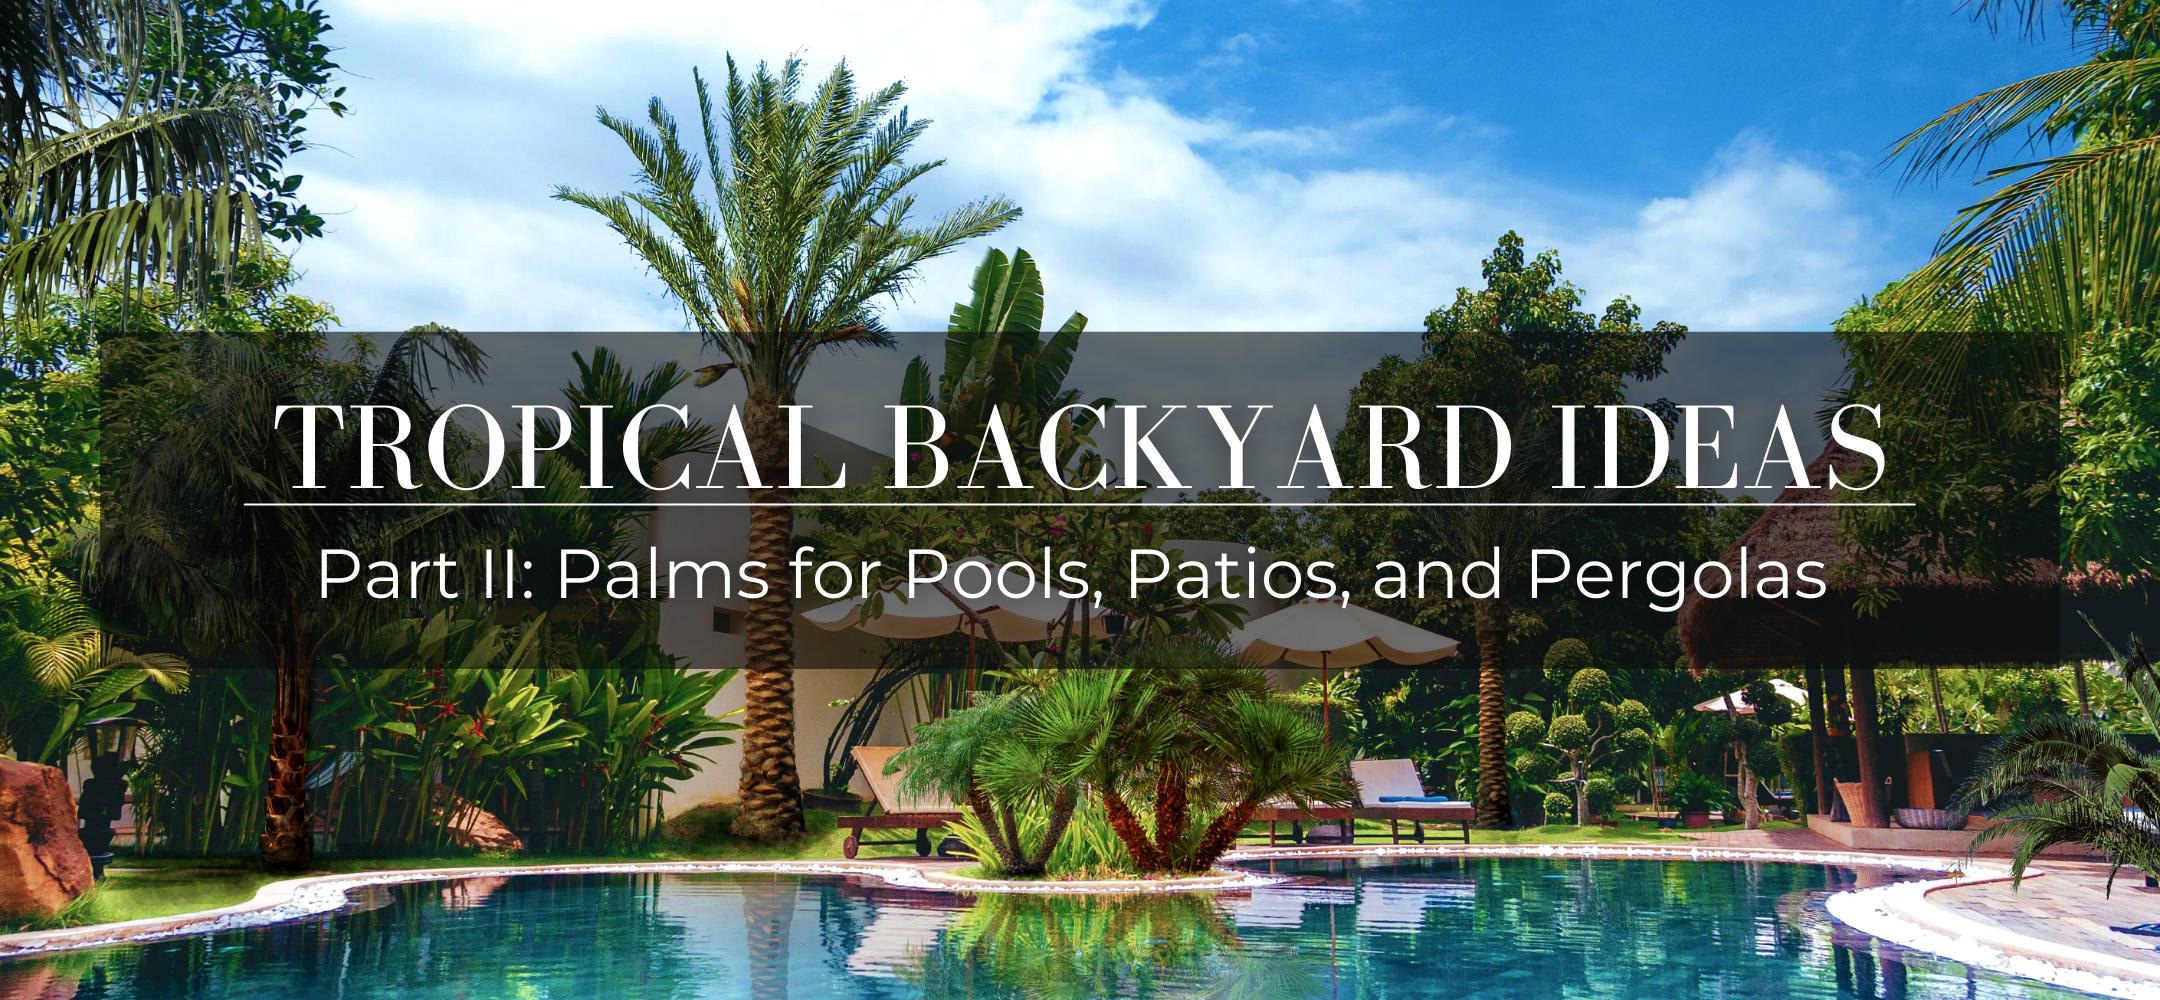 Tropical backyard ideas: palms for pools, patios, and pergolas